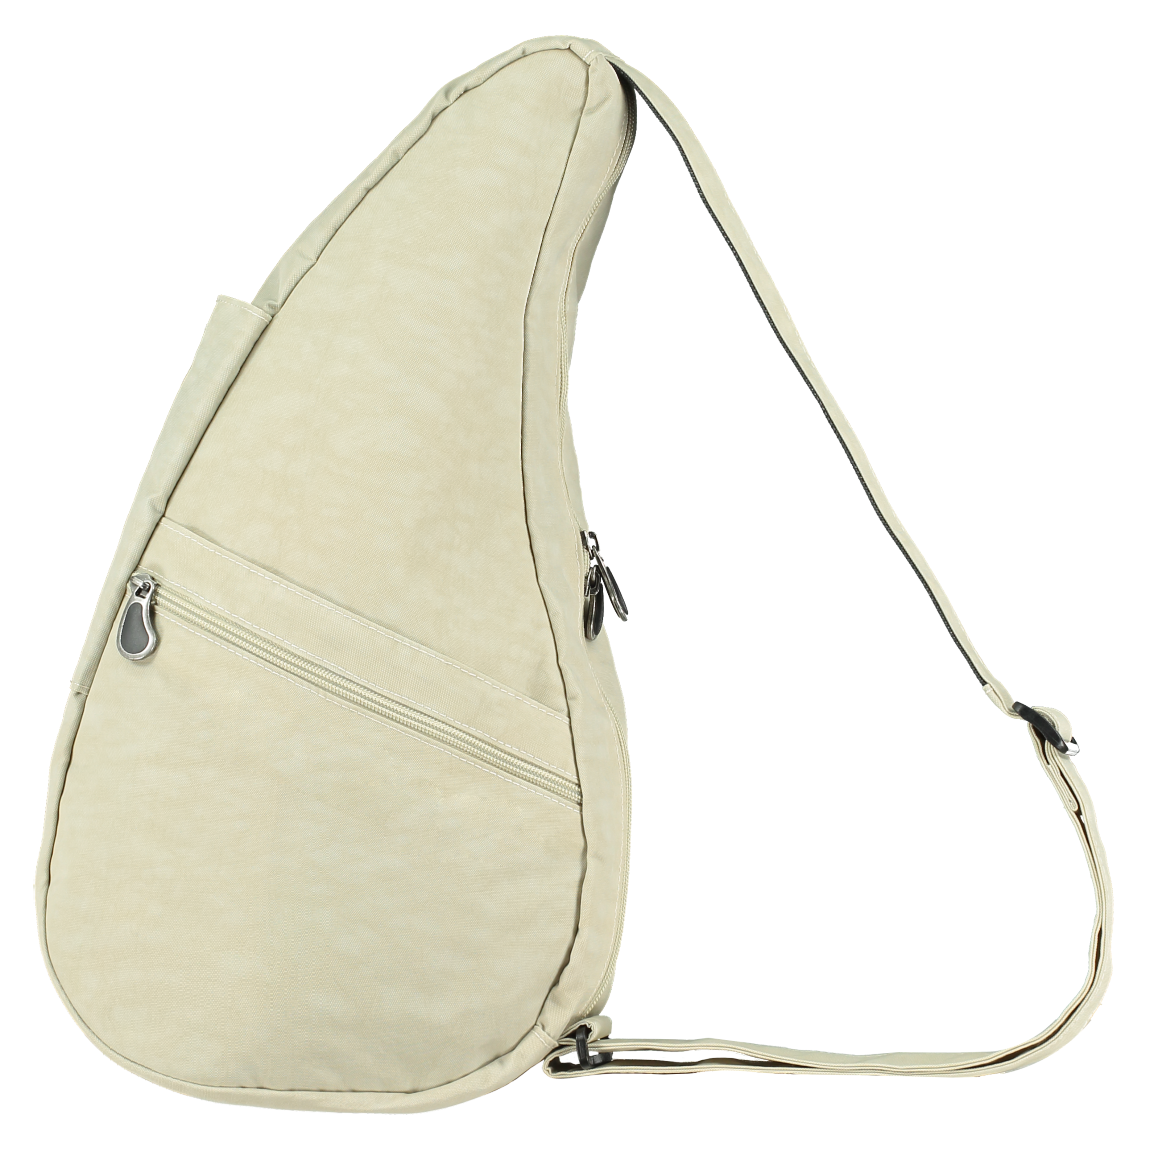 Healthy Back Bag 6303 Textured Nylon Eucalyptus S